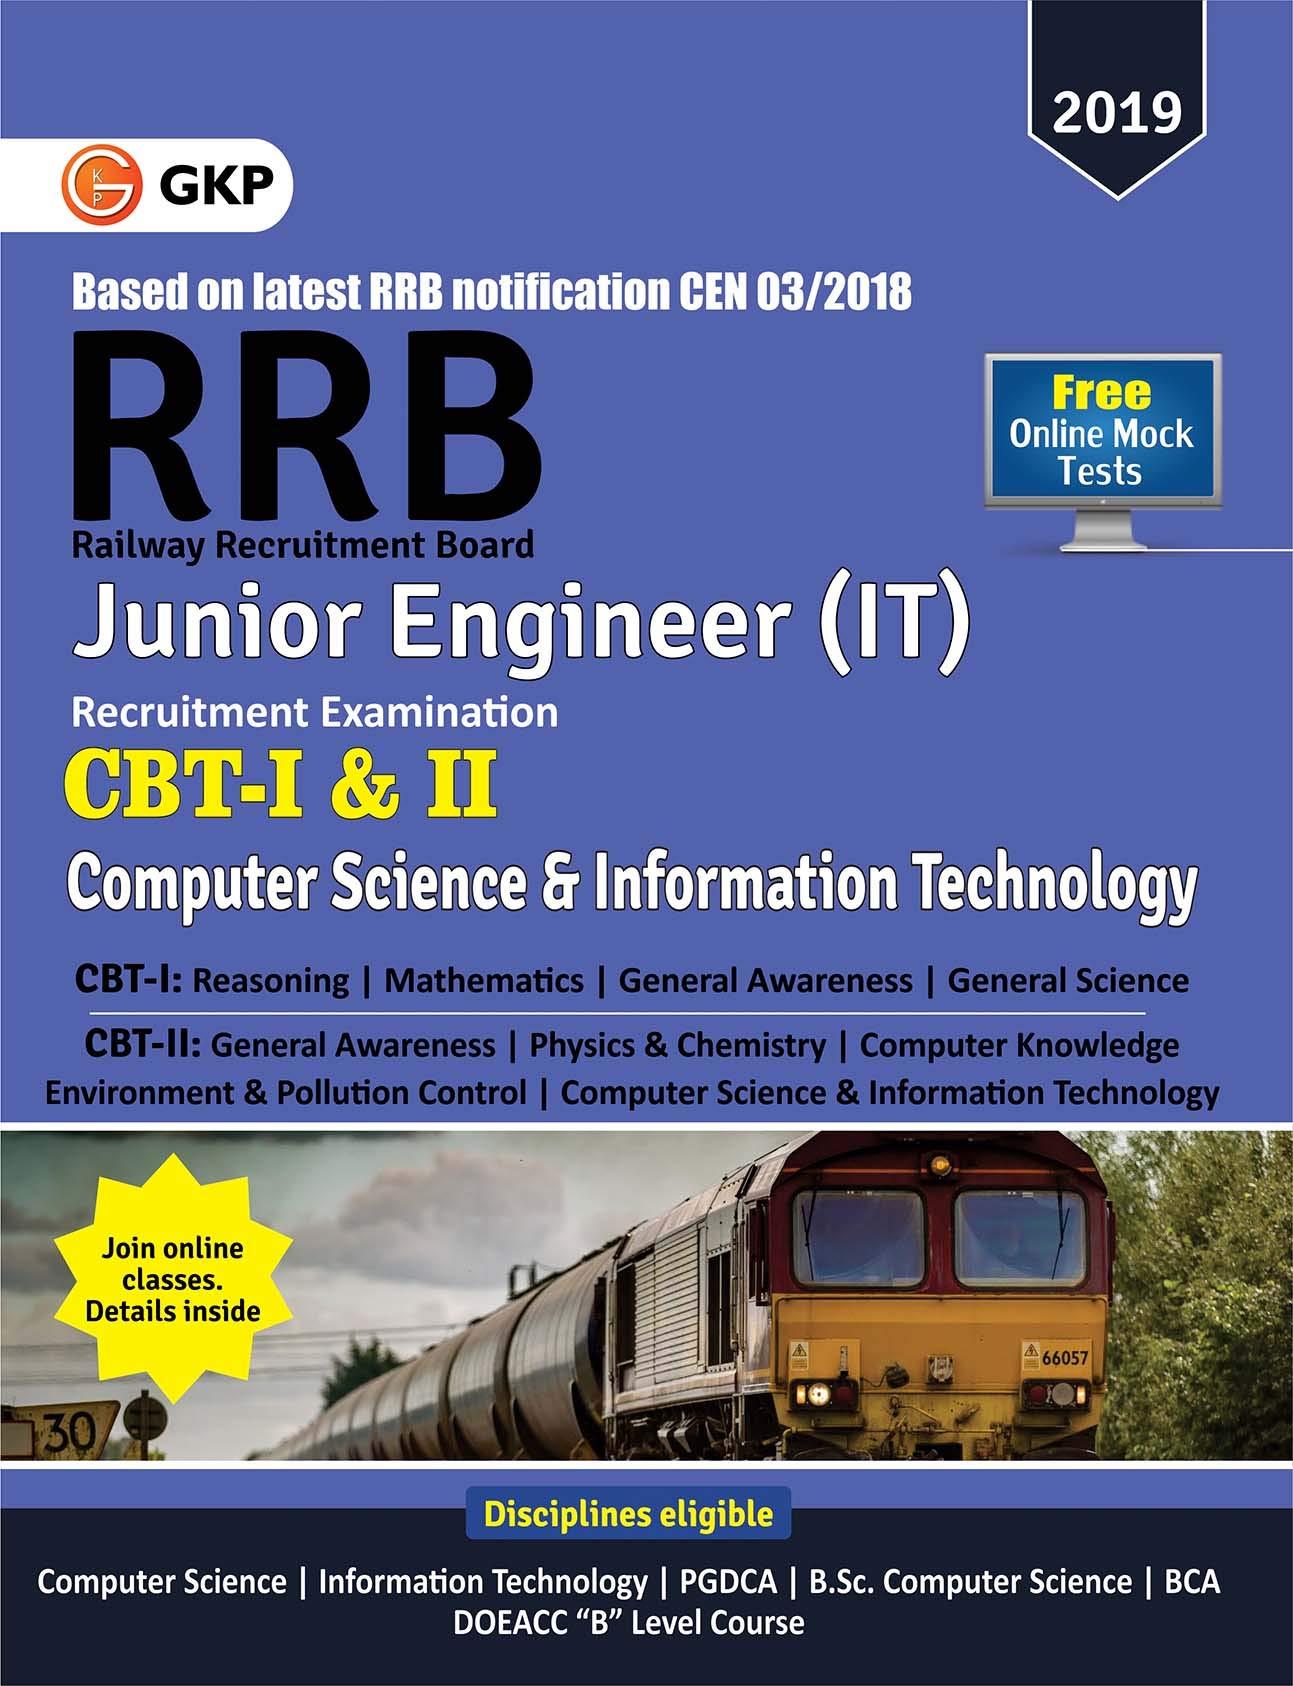 Buy RRB (Railway Recruitment Board) 2019 - Junior Engineer